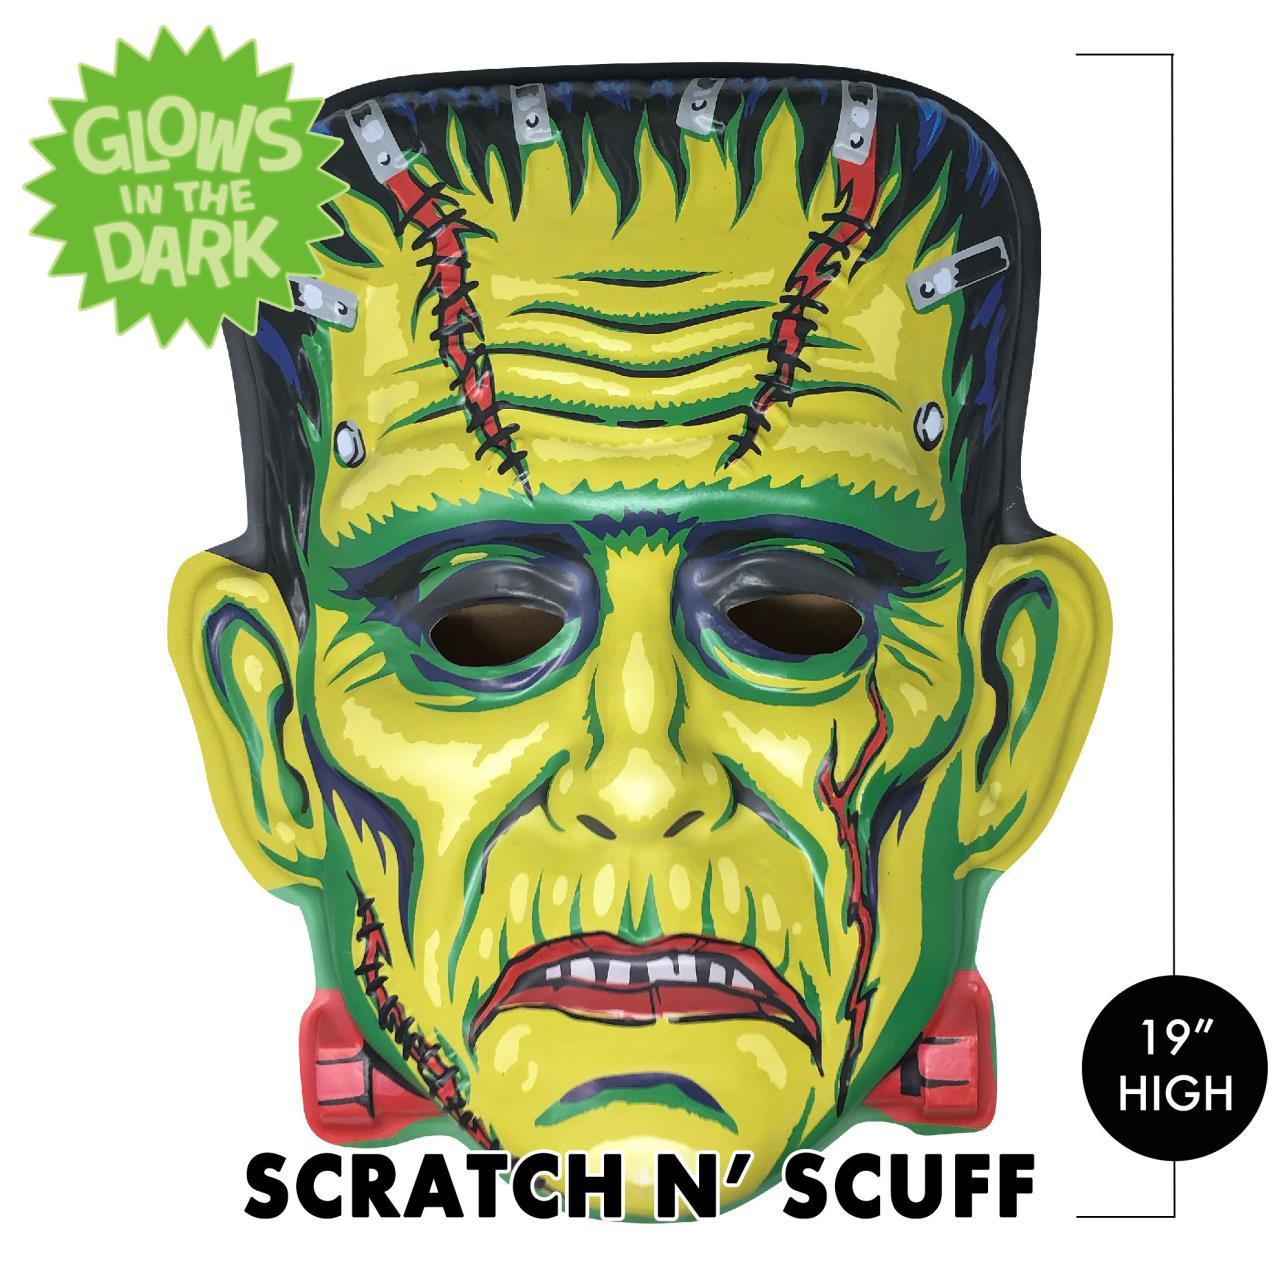 Scratch n' Scuff Cranky Frankie 3-D Wall Decor* -